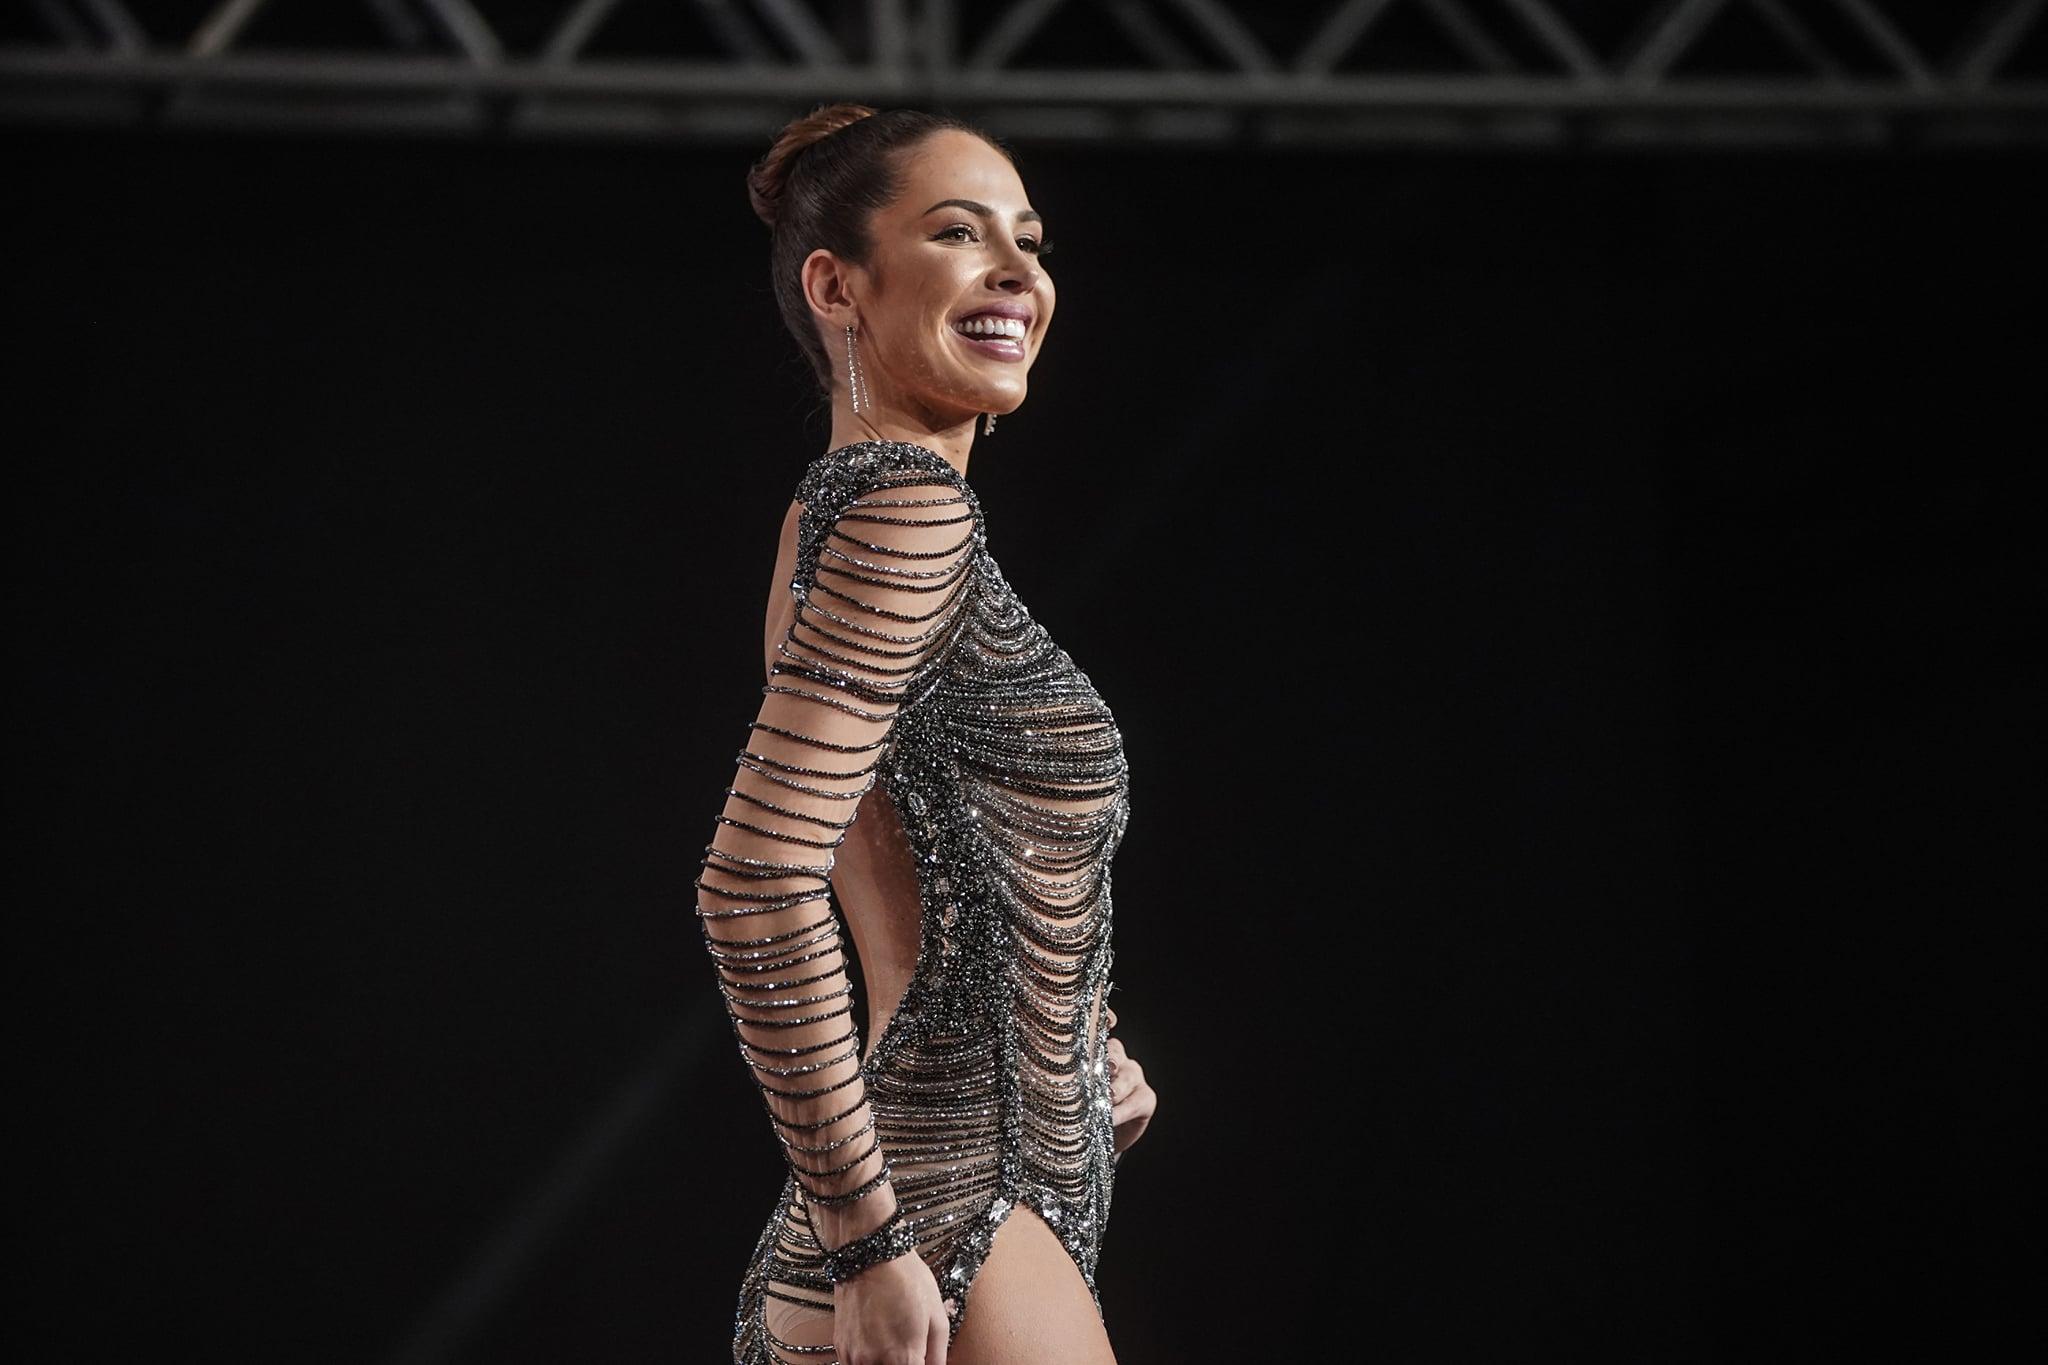 bruna zanardo, 1st runner-up de miss supranational brazil 2020/miss brasil internacional 2017/miss brasil terra 2016. - Página 19 12865010